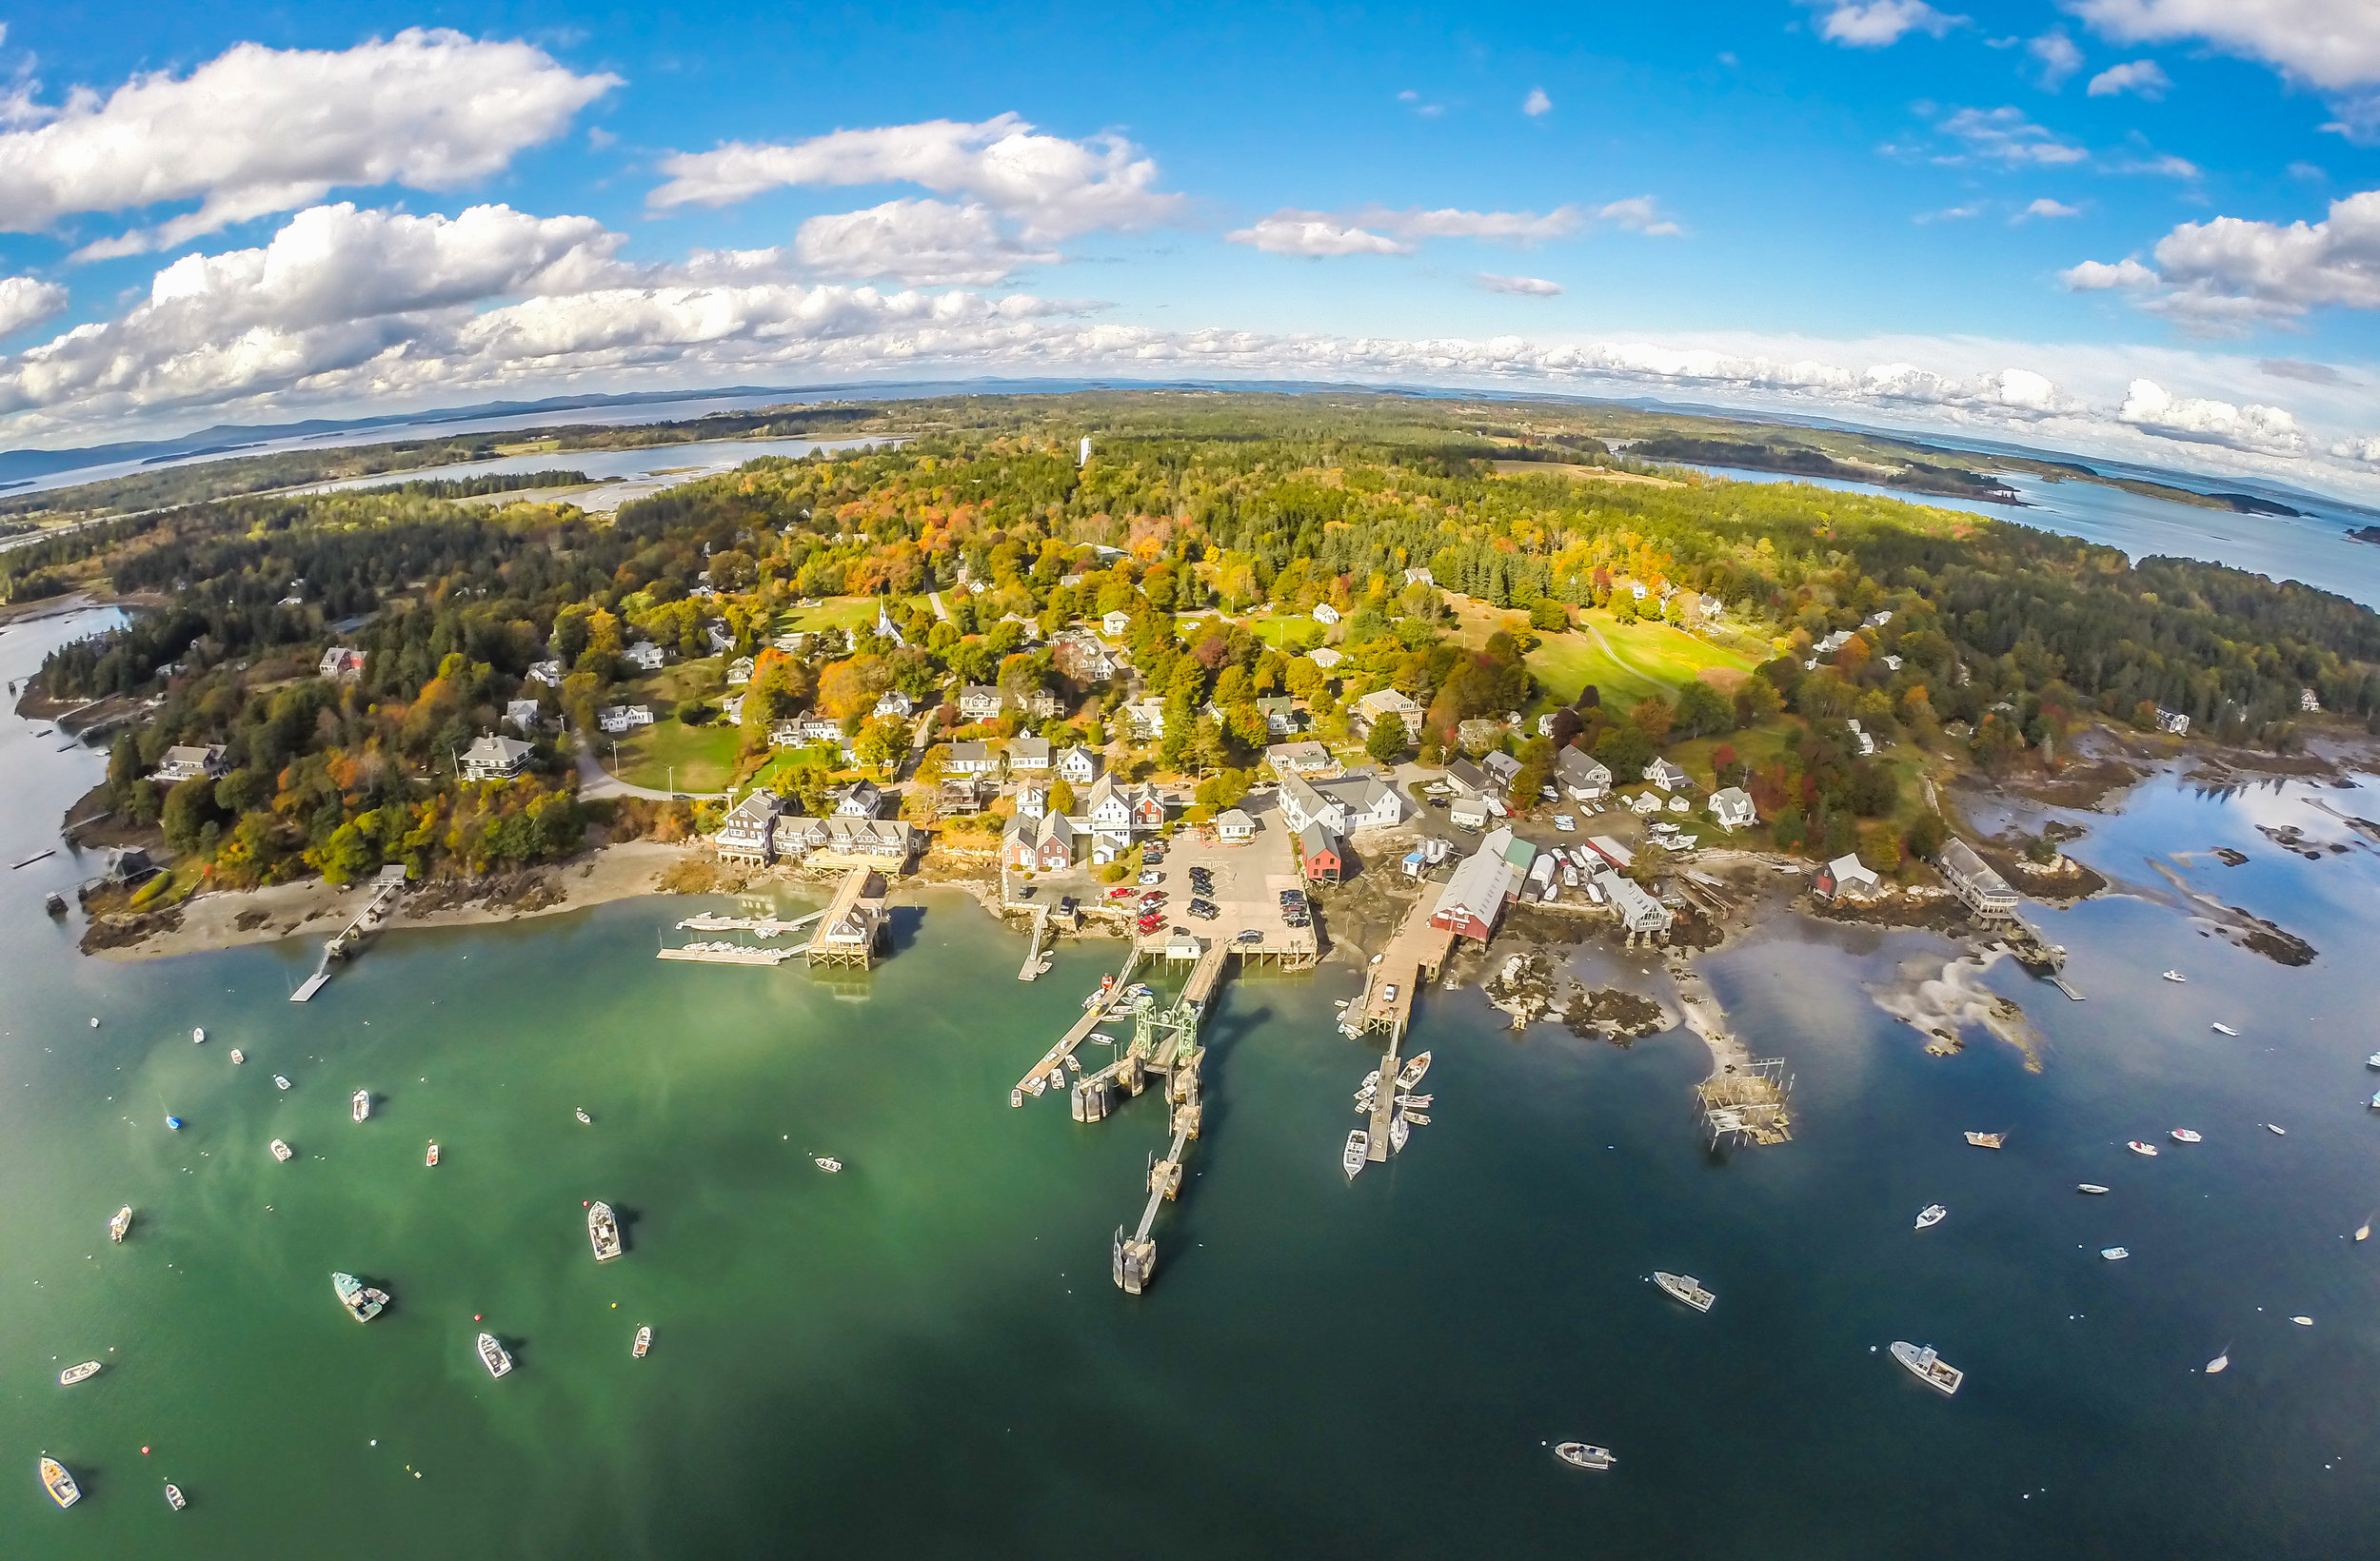 North Haven Village, 2014 – Photo by Bill Trevaskis